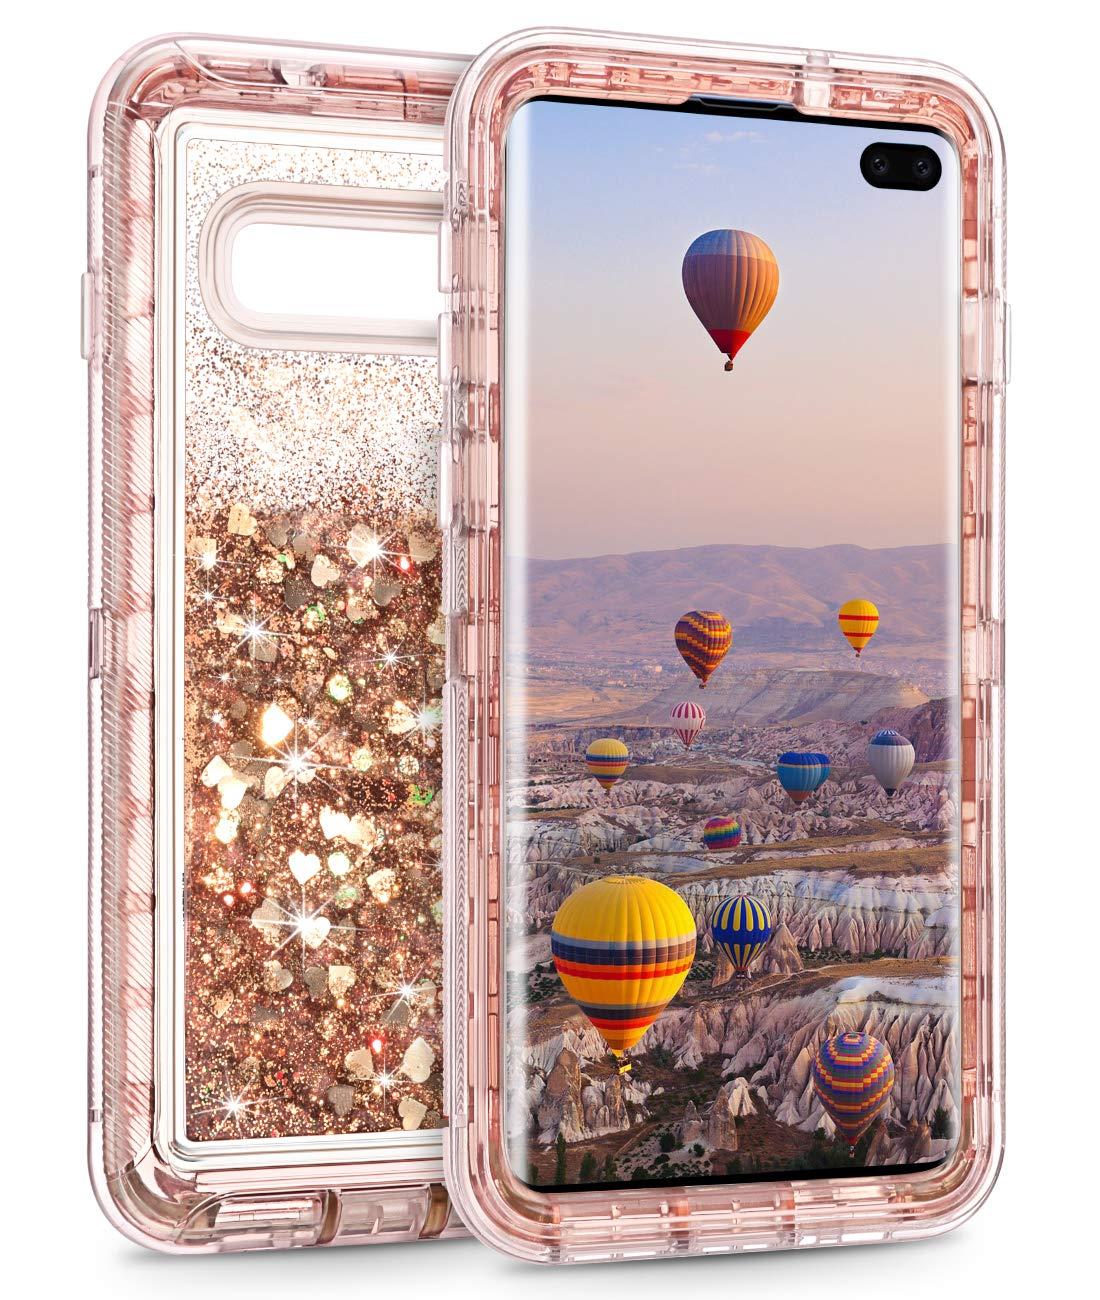 Funda Samsung Galaxy S10 Plus 6.4 Pulgadas Glitter  (xsr)